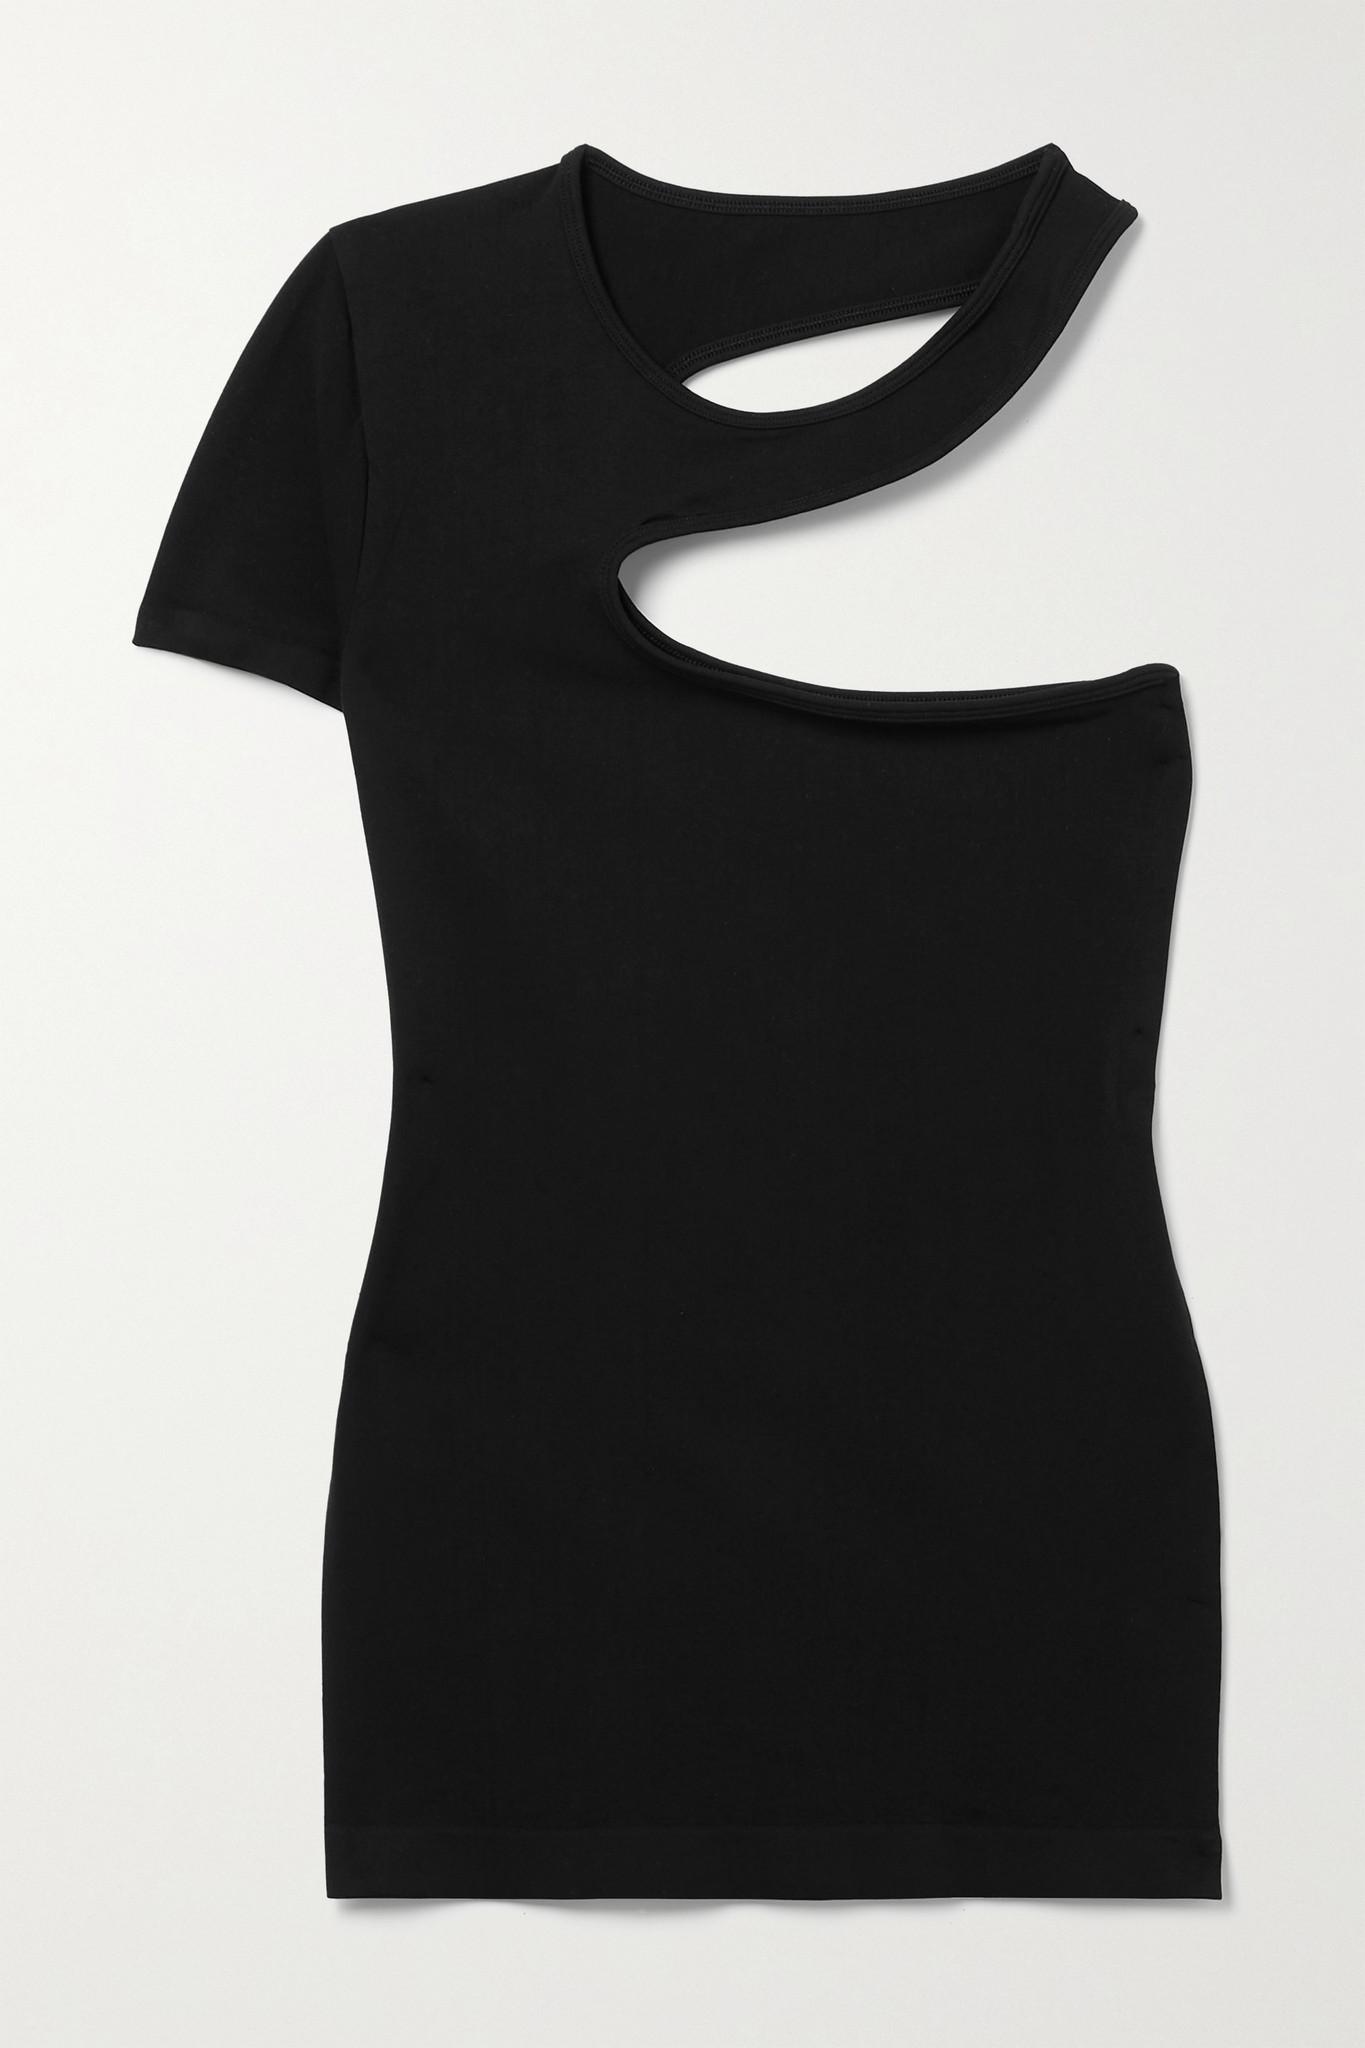 HELMUT LANG - 单肩挖剪弹力平纹布 T 恤 - 黑色 - XS/S